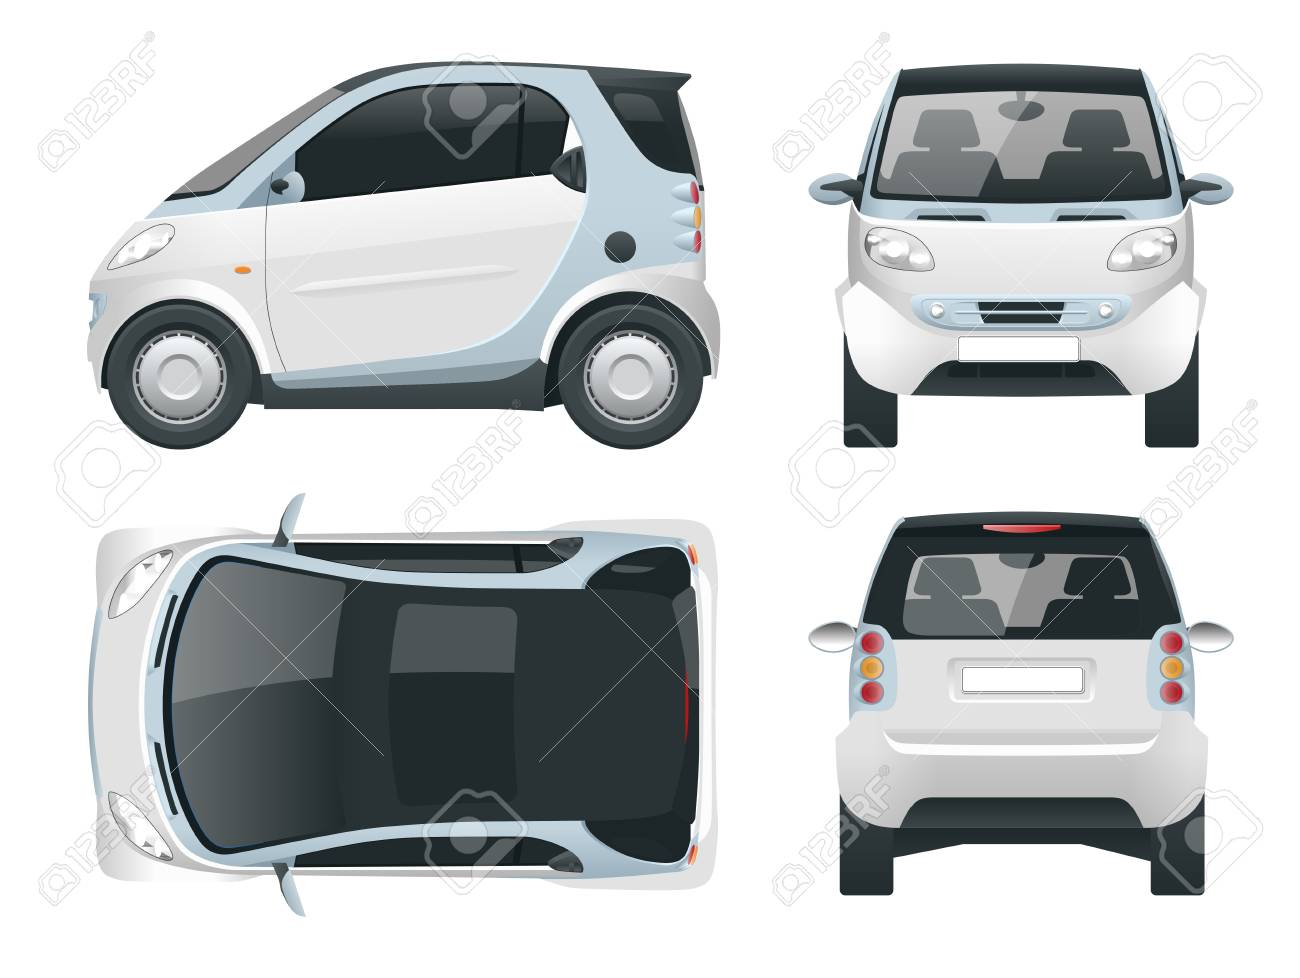 Hi Tech Automotive >> Vector Compact Smart Car Small Compact Hybrid Vehicle Eco Friendly